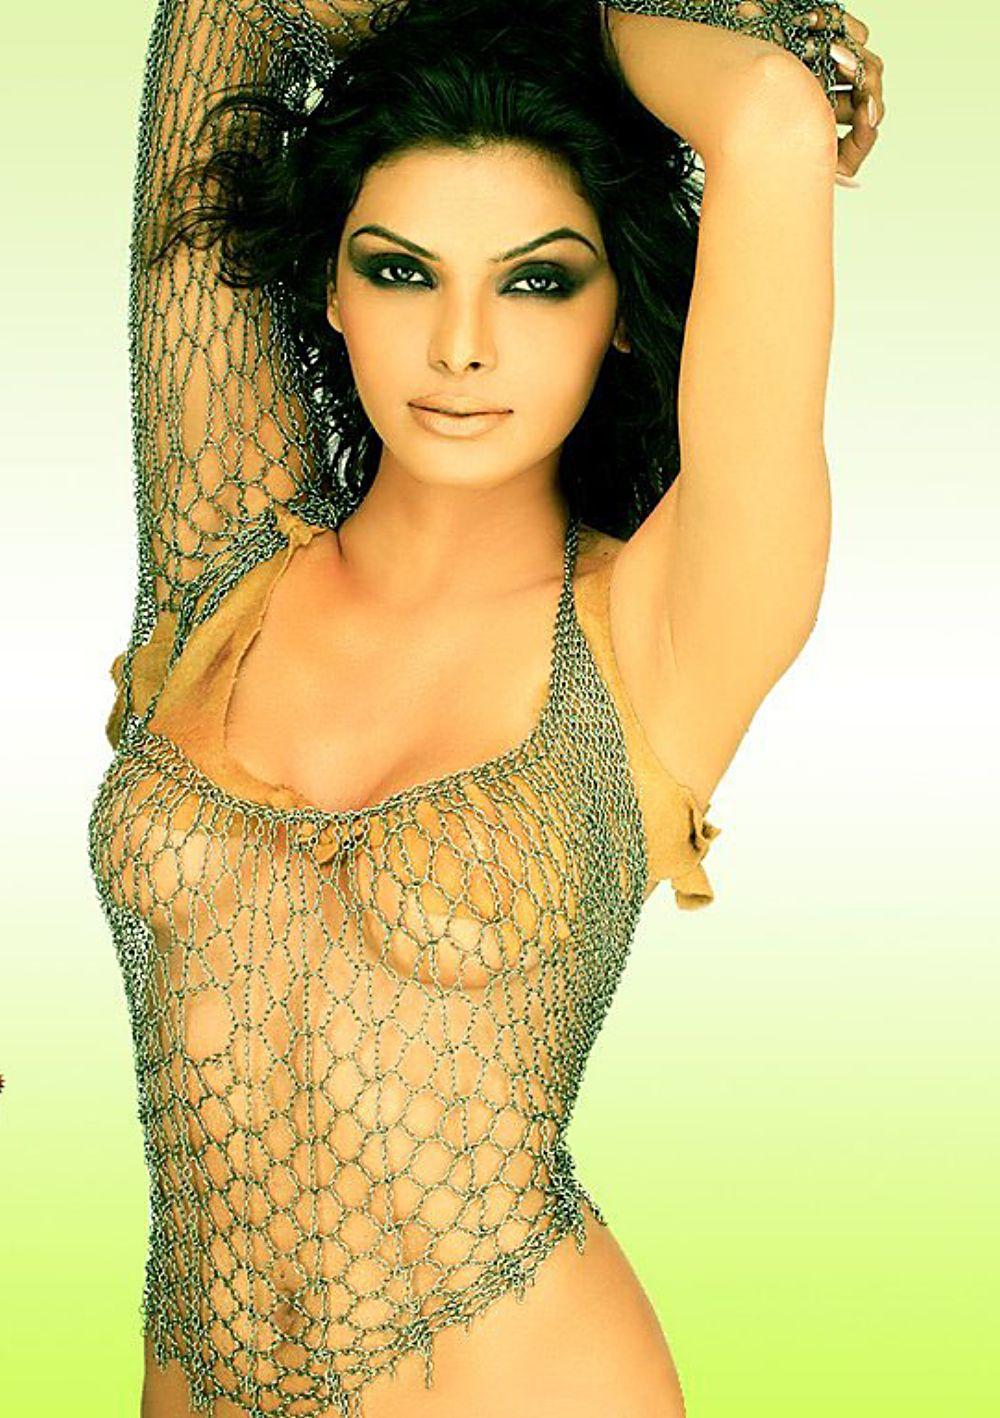 Transparent nude womens wallpaper xxx scene